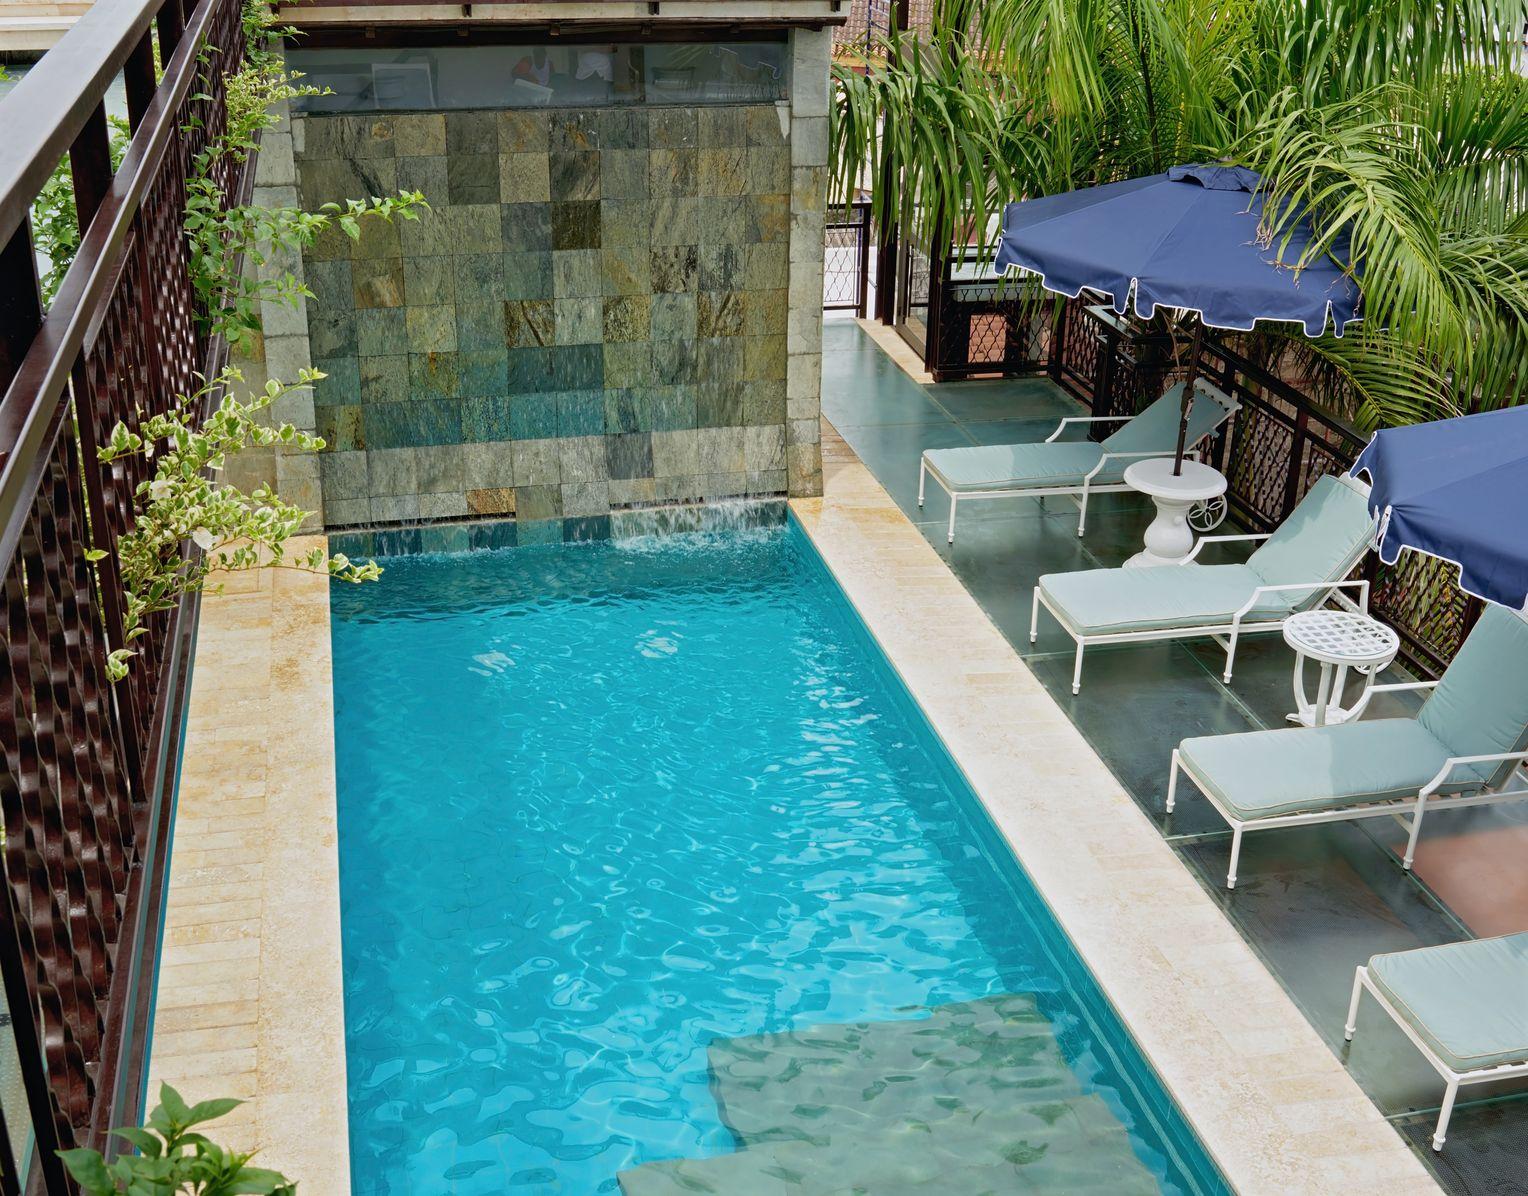 The dreamy pool area.Photo by  Tawfick Espriella .